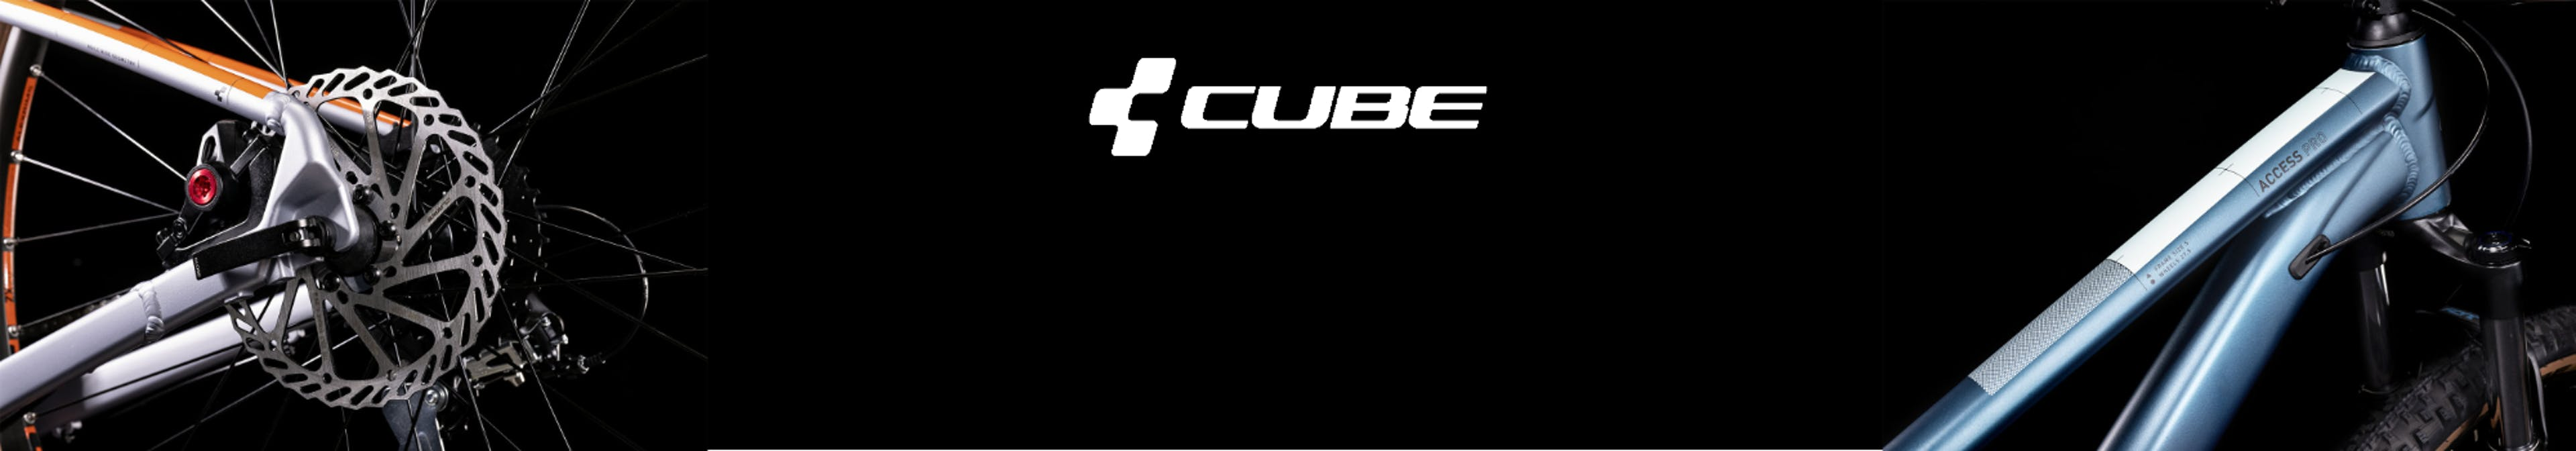 Cube Bike Onlineshop